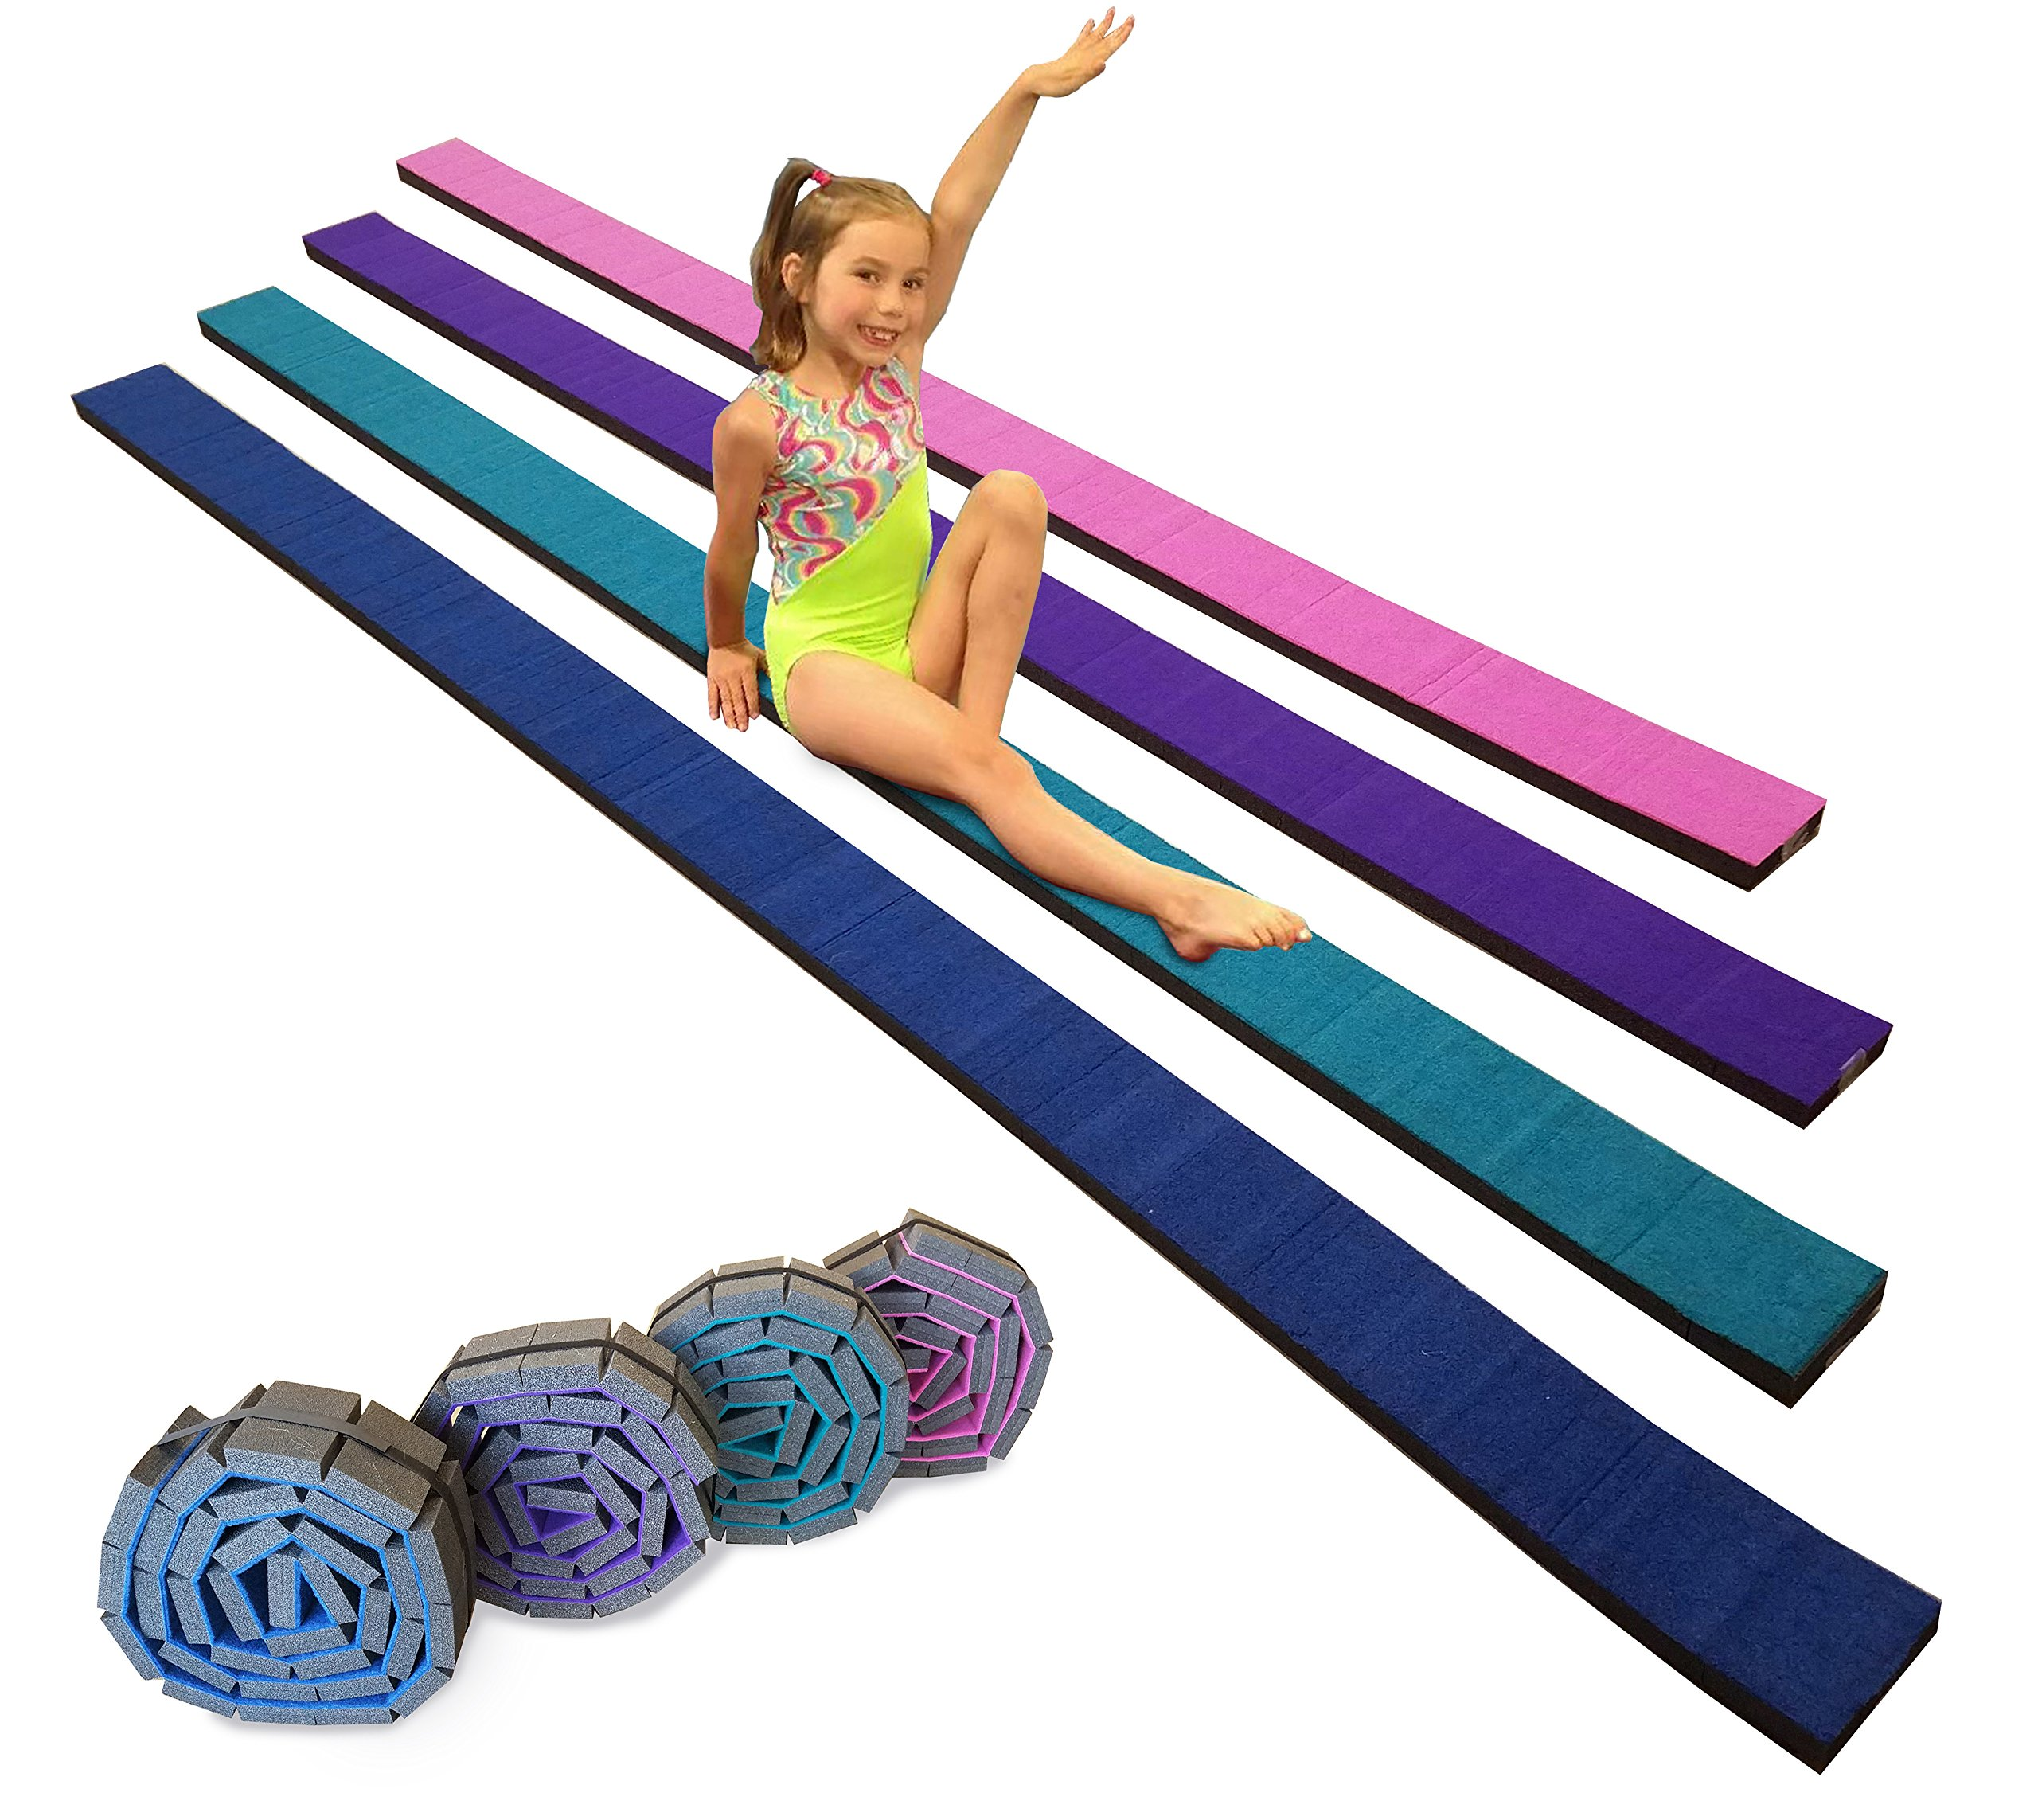 Gymnastics Flexible Roll-Up Foam Training Balance Beam! (Blue) by Team Sports (Image #1)